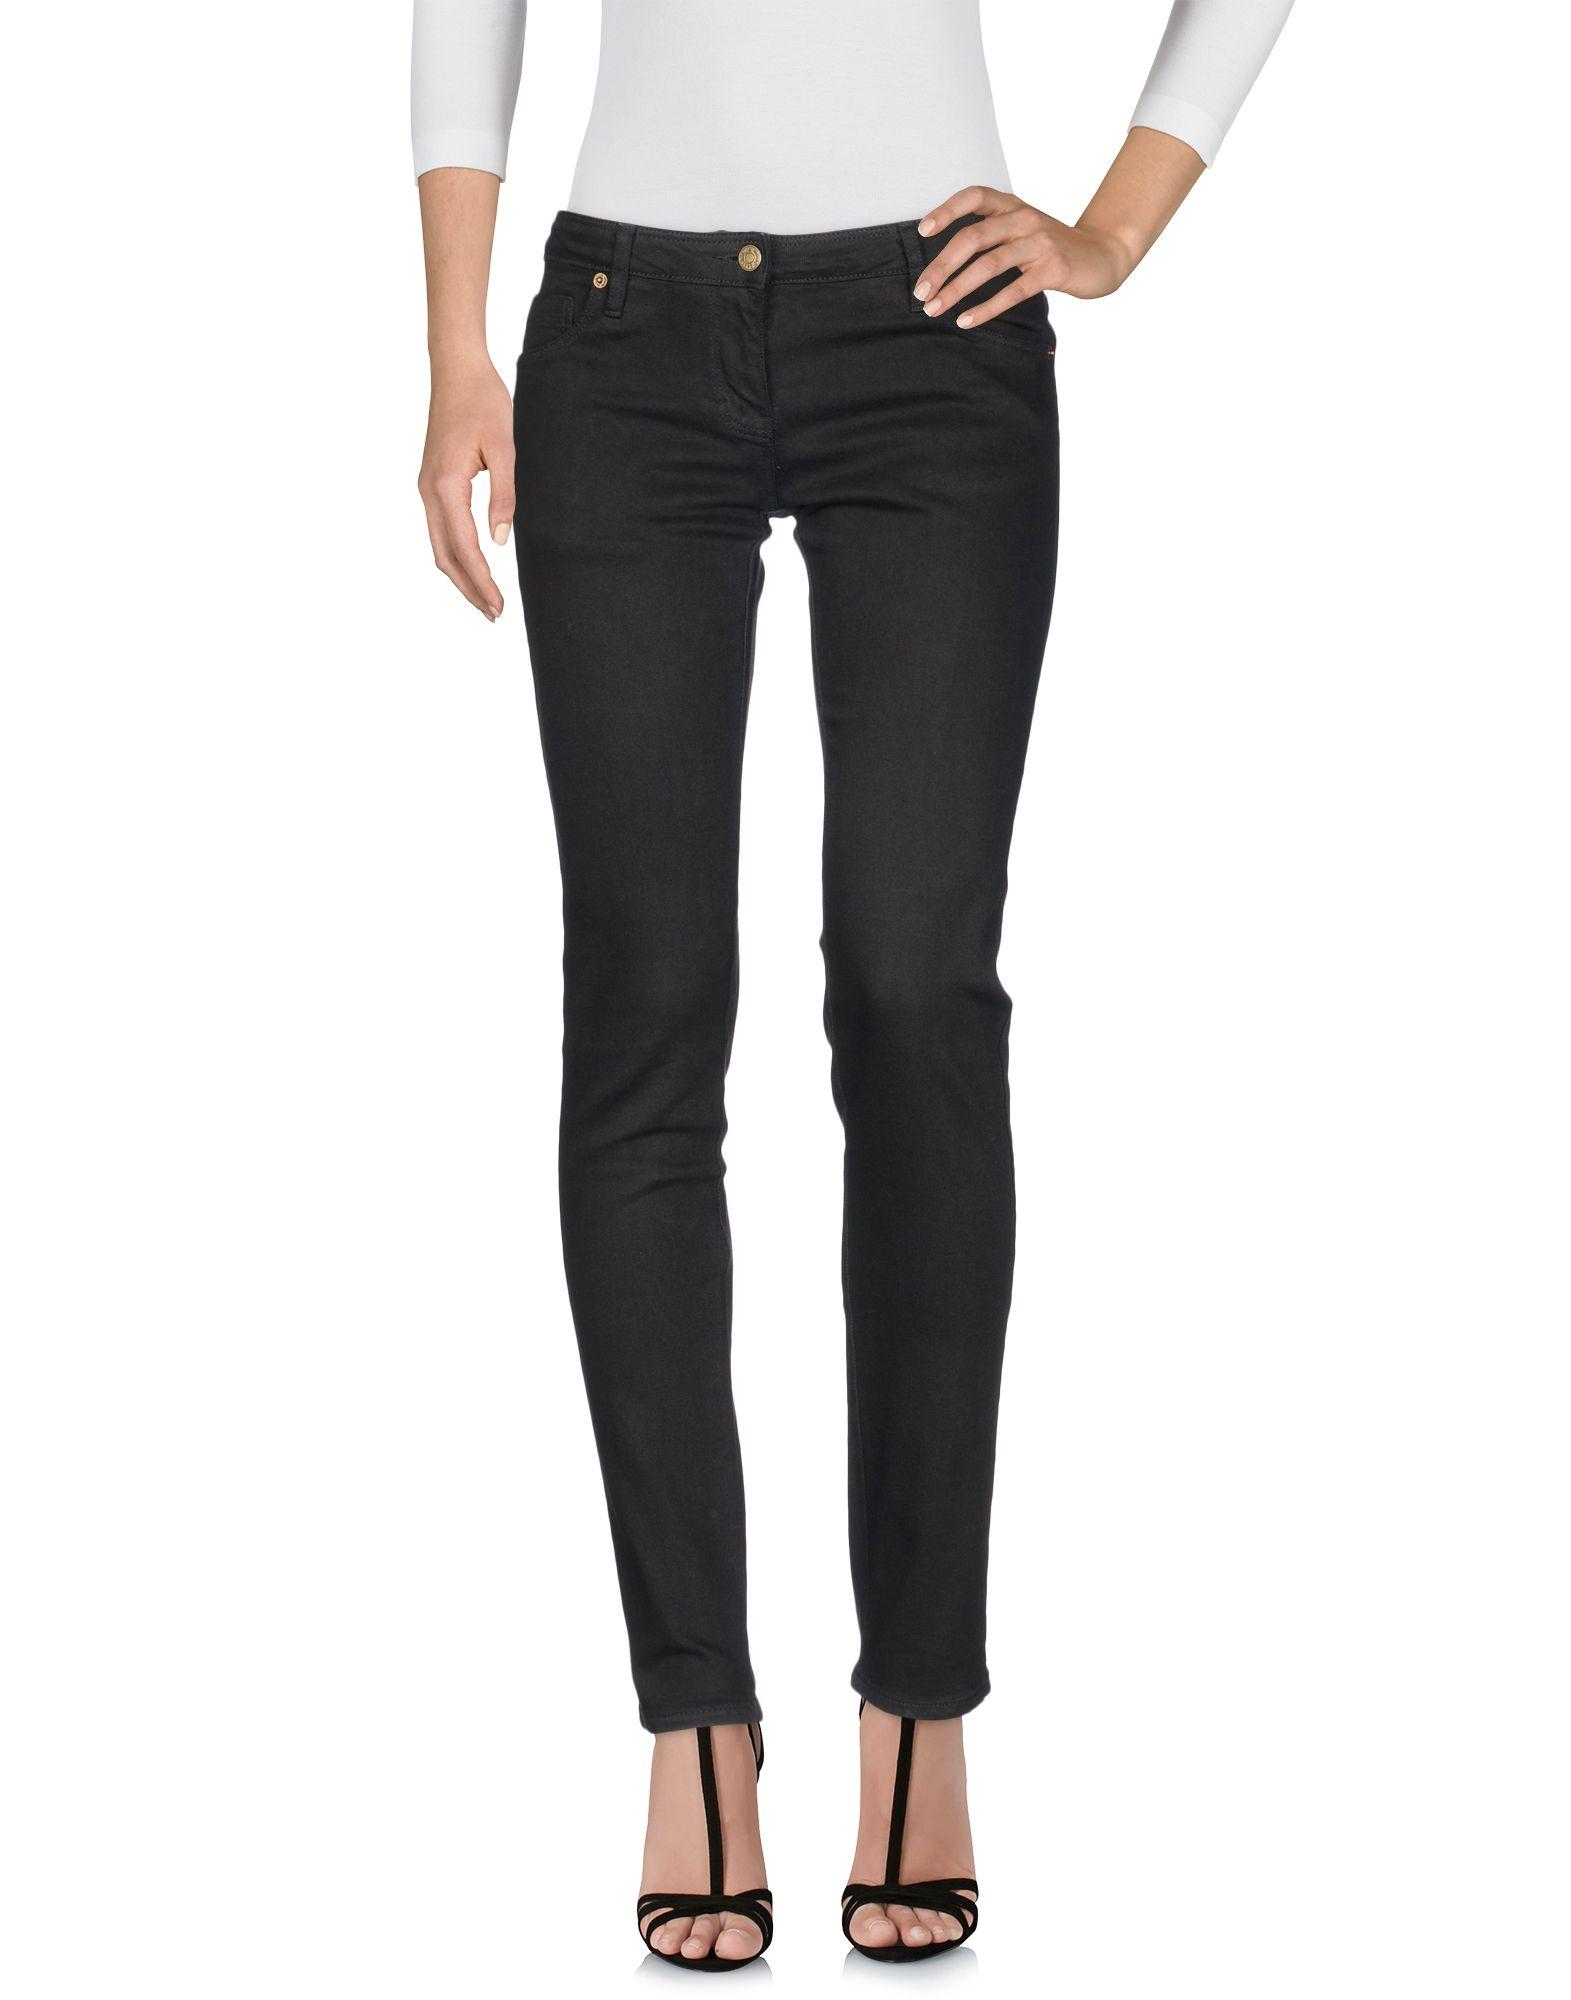 SASS & BIDE Denim Pants in Black